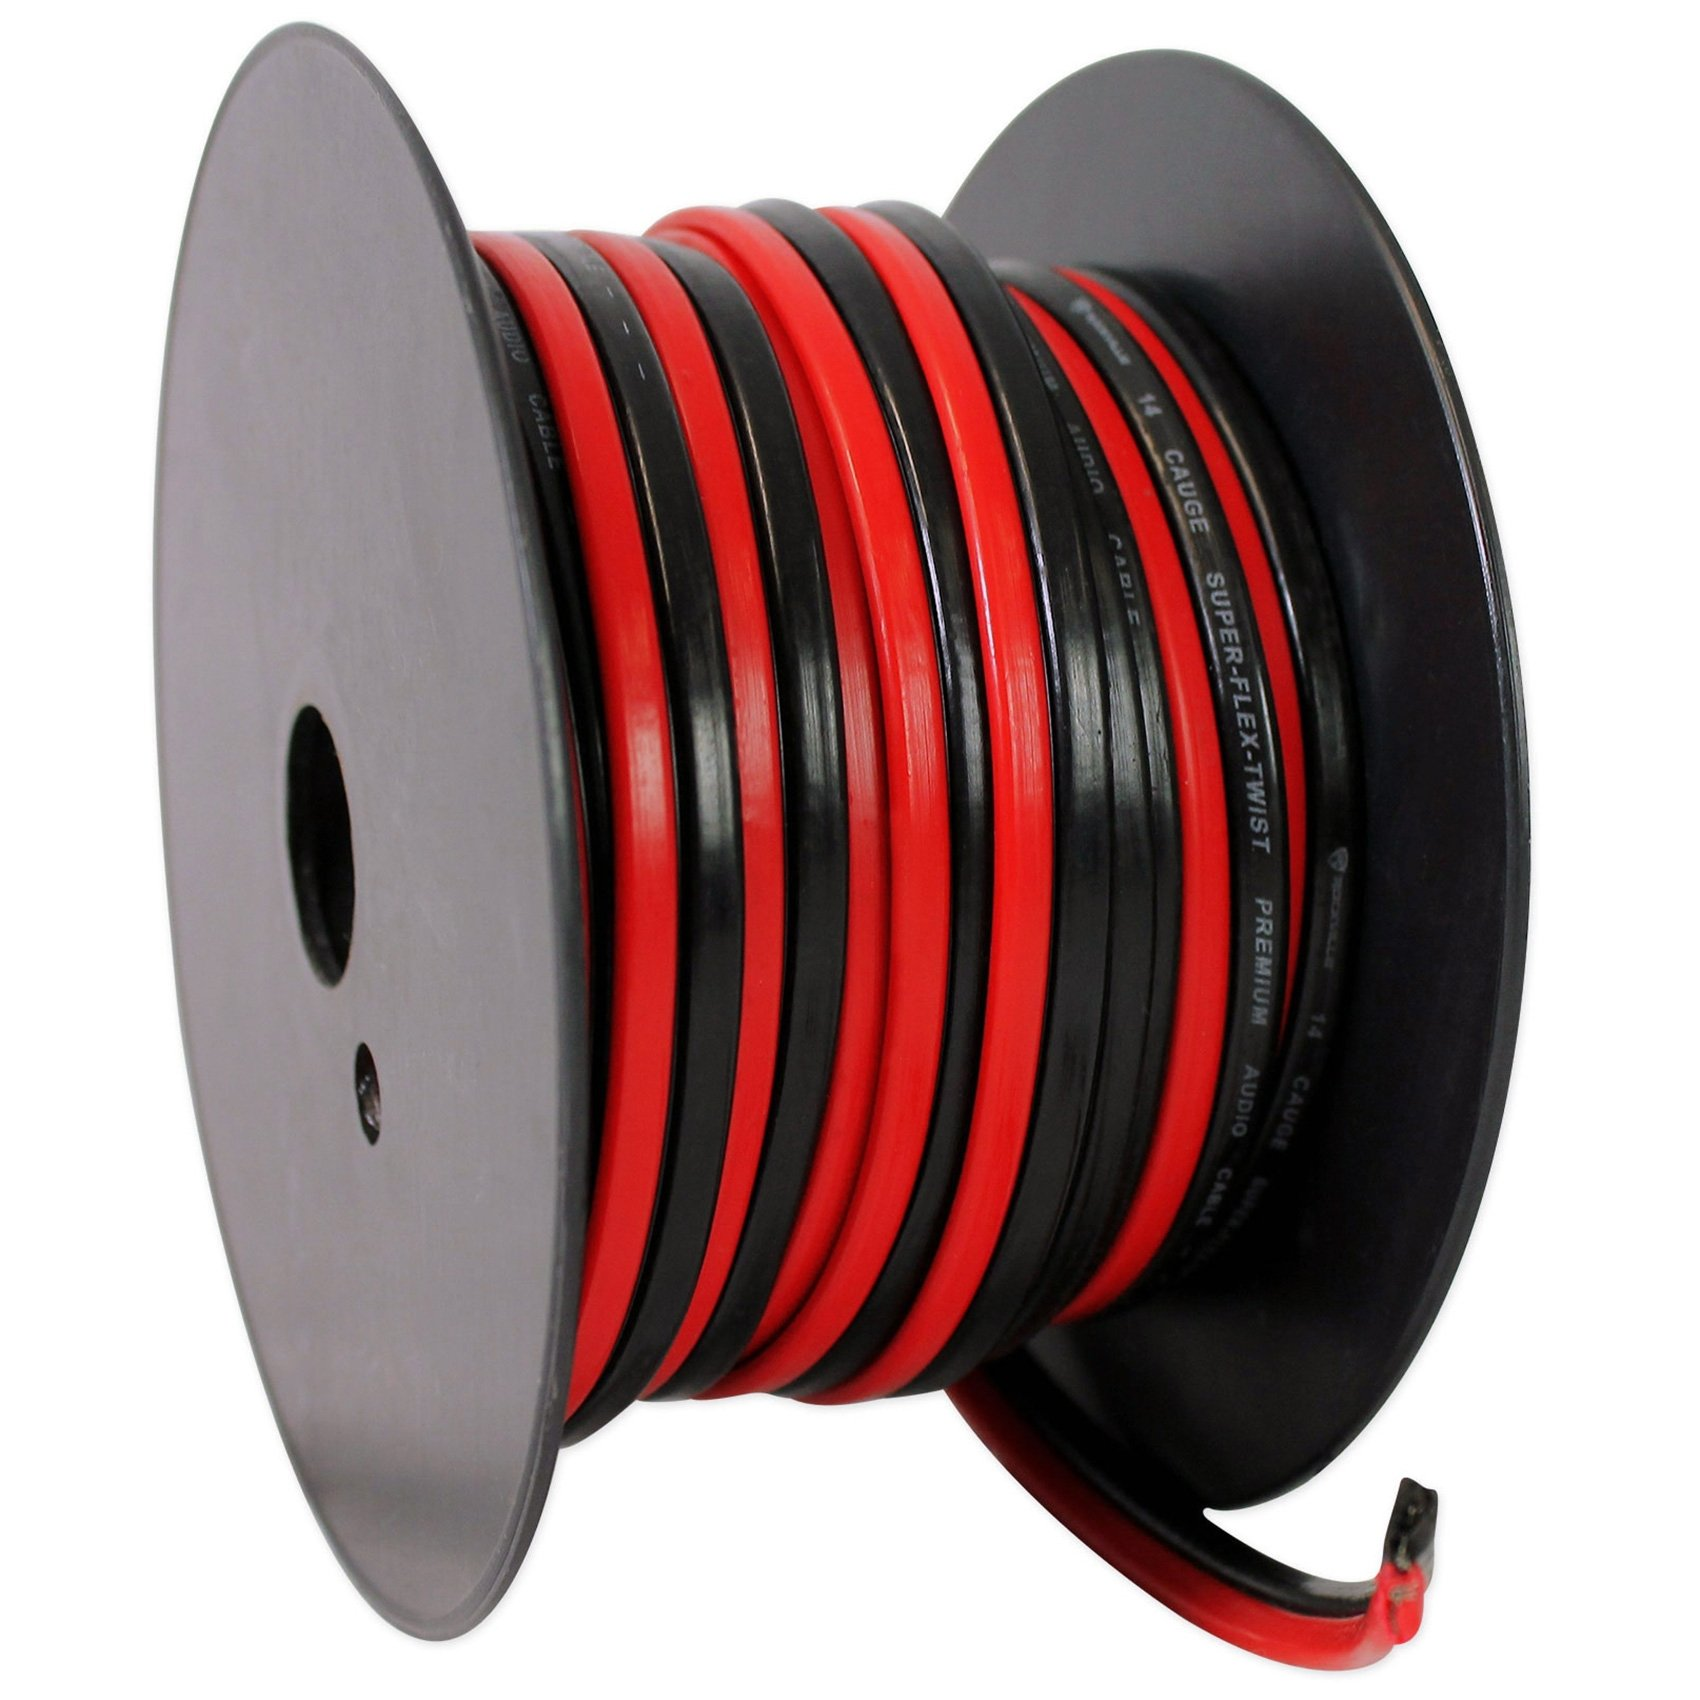 Rockville R14GSBR50 Red/Blk 14 Gauge 50' Ft. Mini Spool Car Audio Speaker Wire